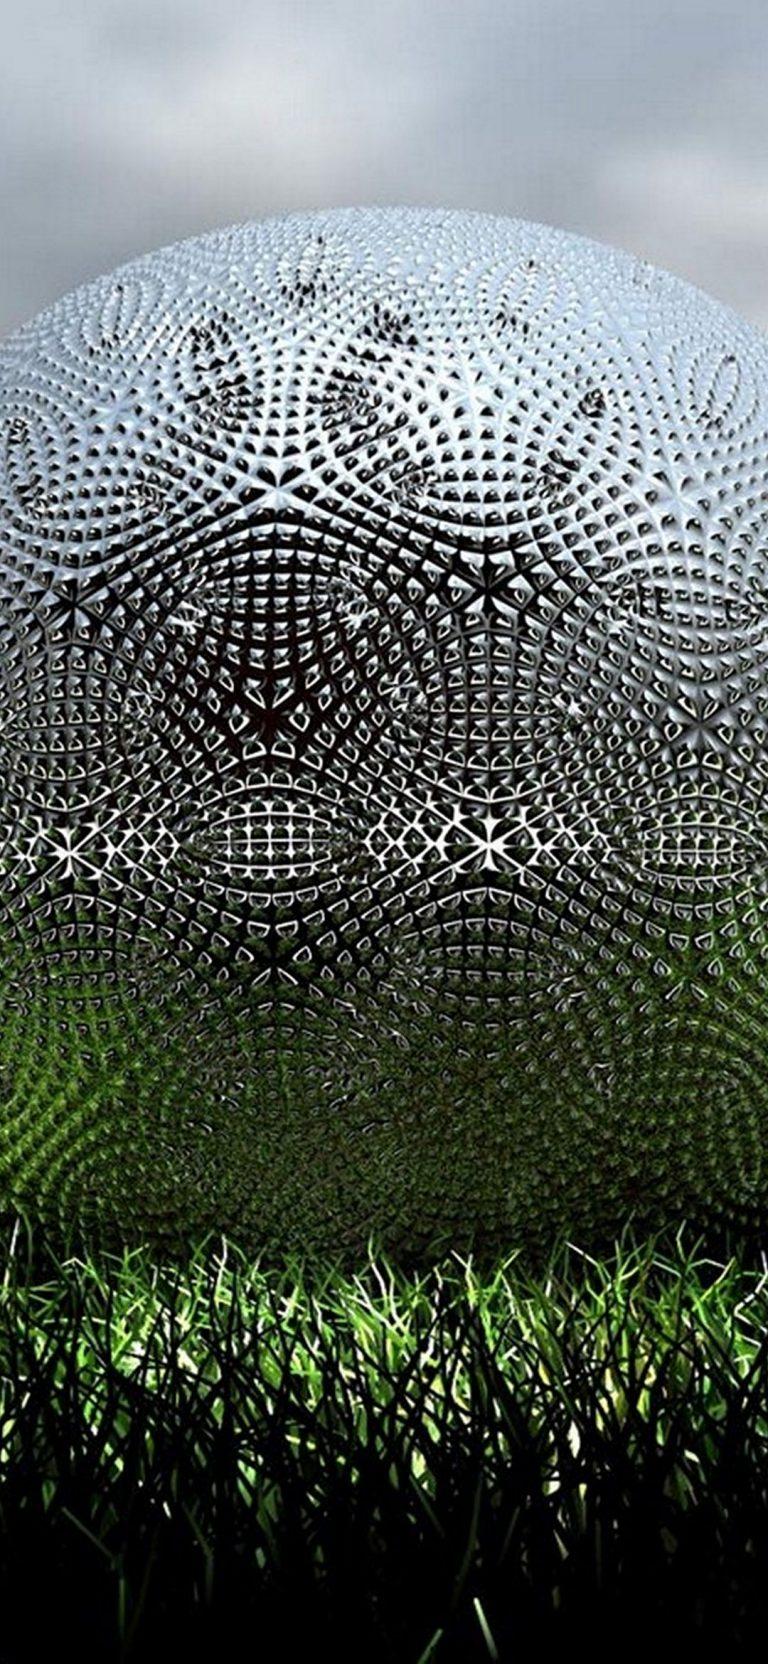 3D Phone Wallpaper 016 1080x2340 768x1664